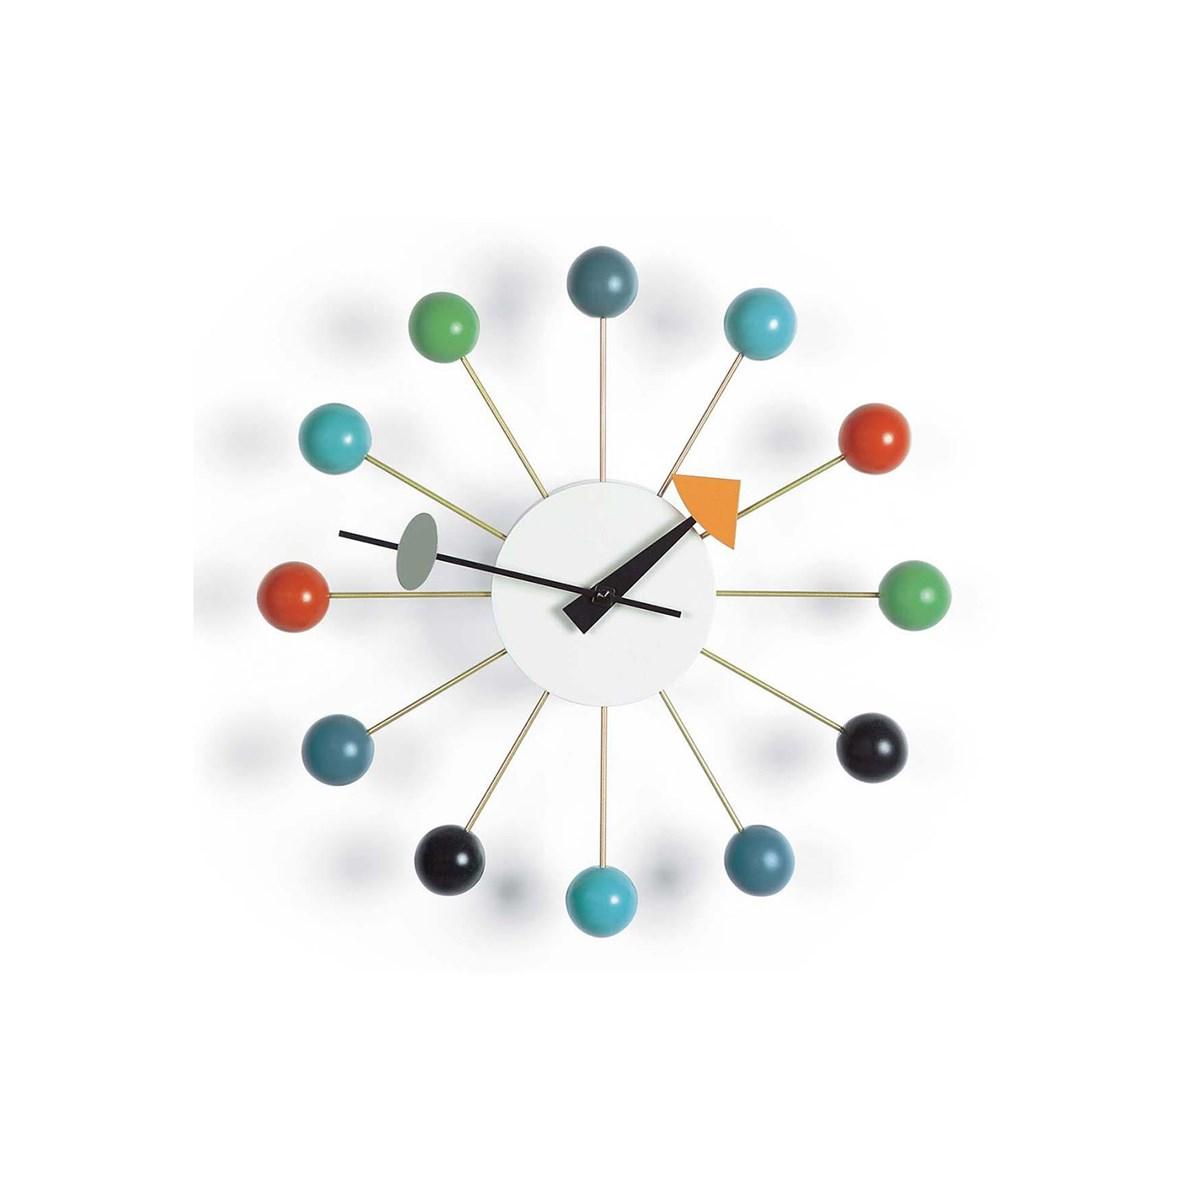 Vitra-George-Nelson-Ball-Clock-Matisse-1